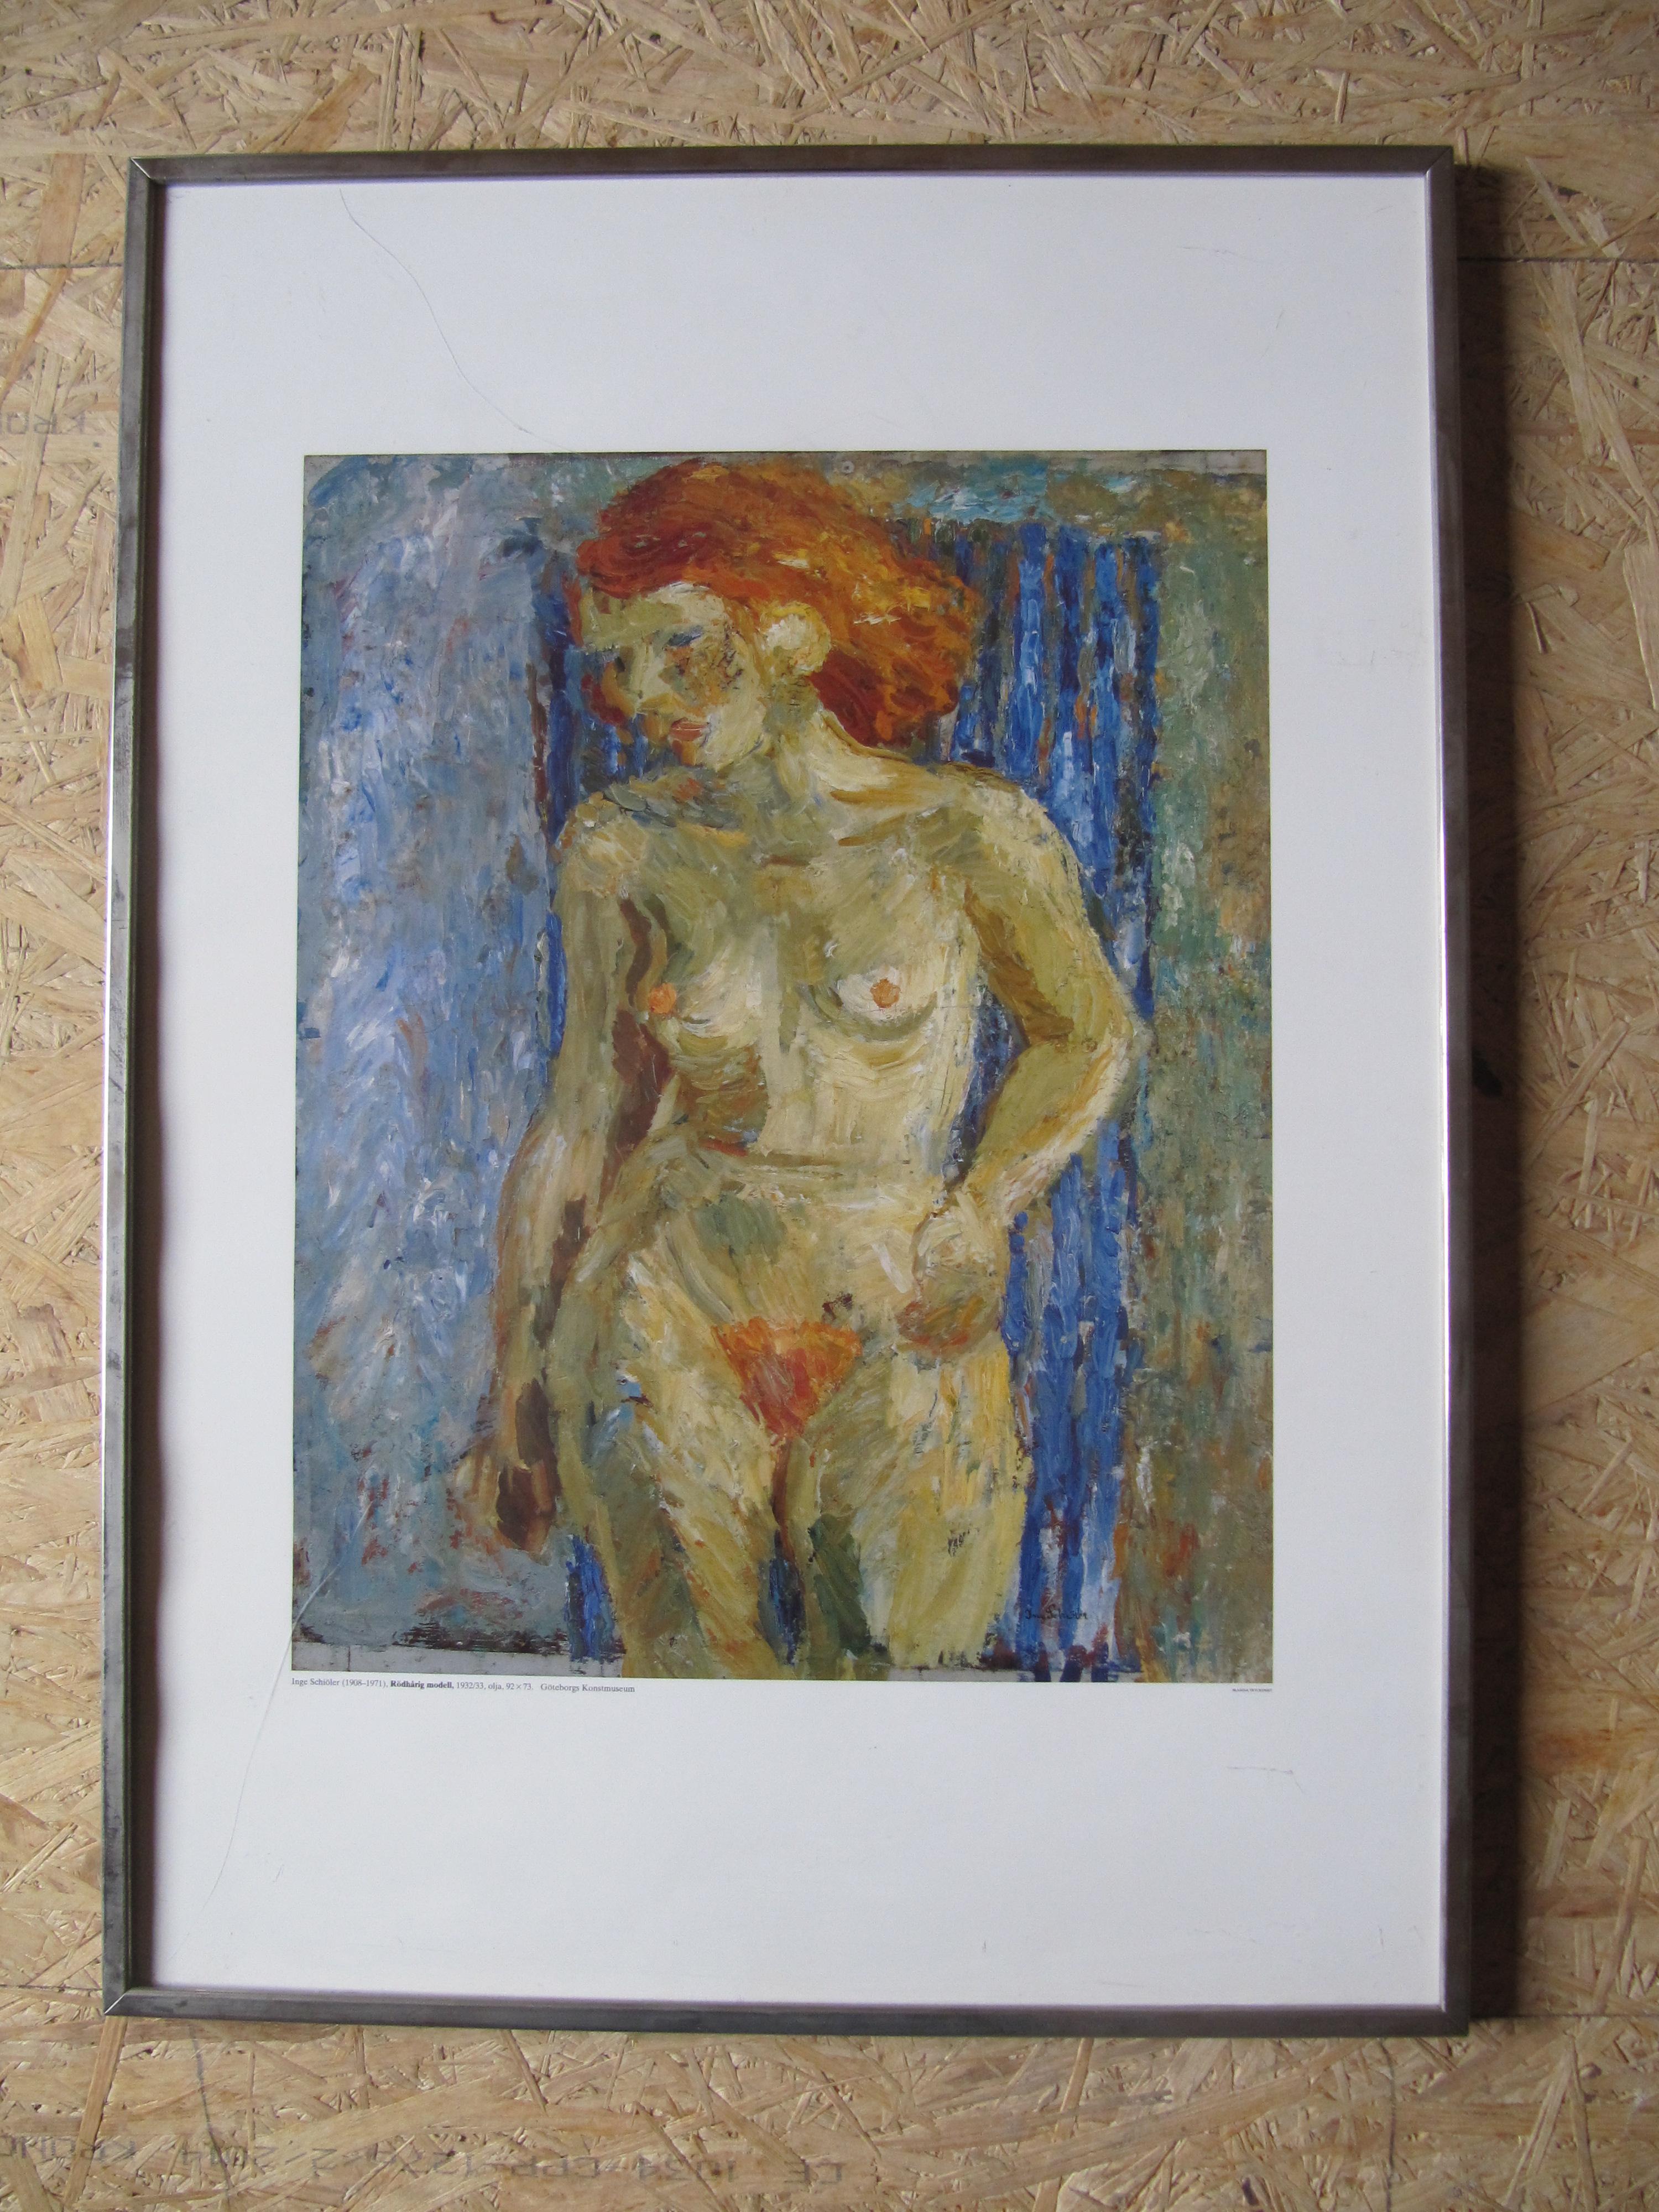 INGE SCHOLER 1908-1971   -1932 REPRUDUKCIJA